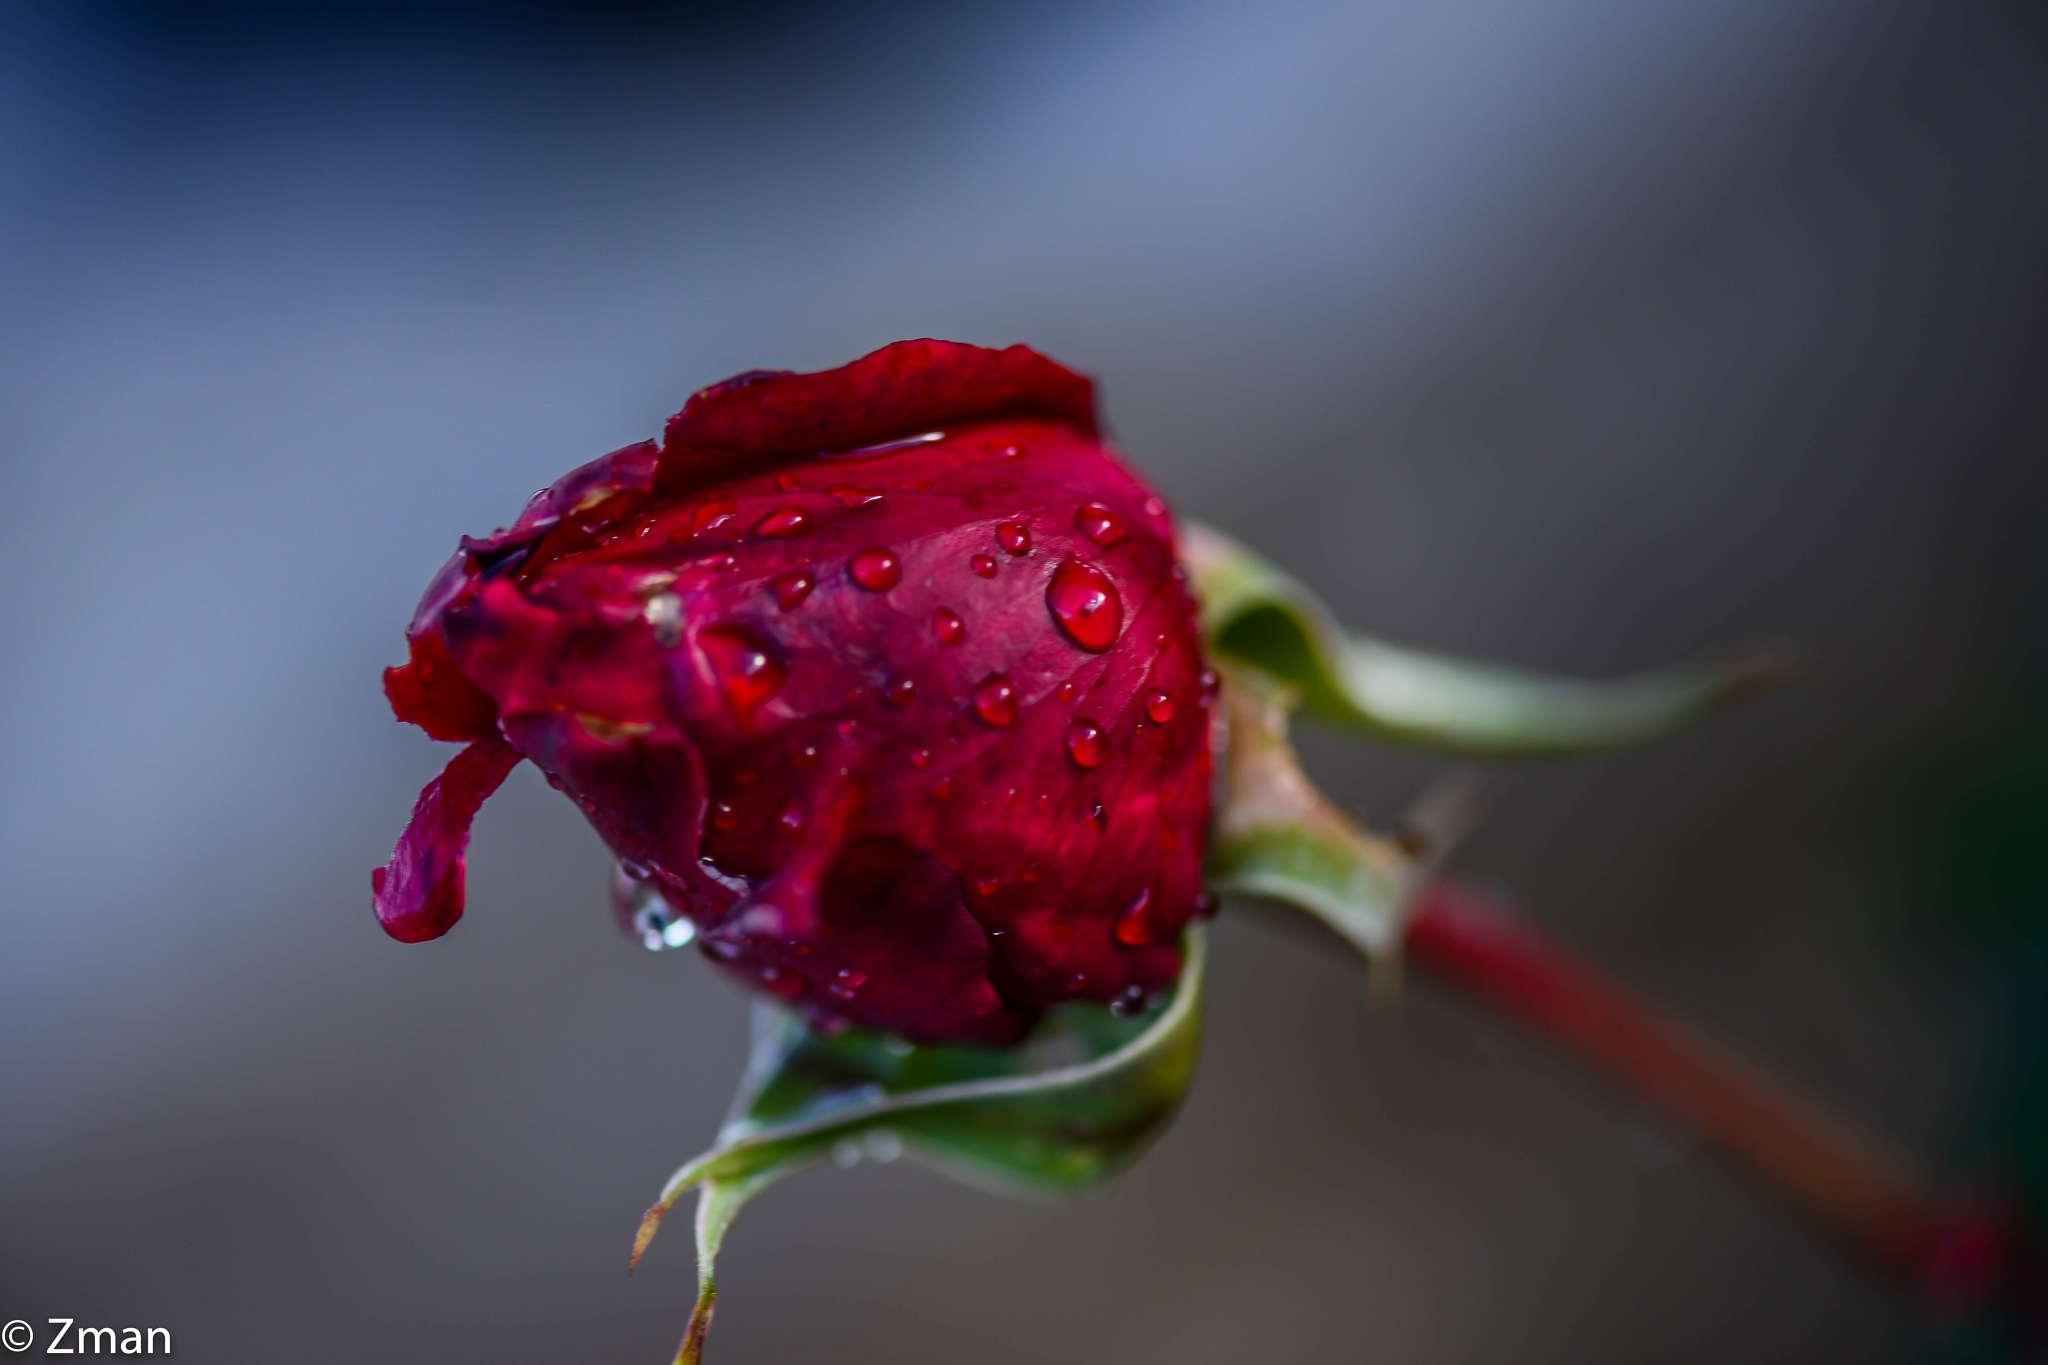 Red Rose under the Rain by muhammad.nasser.963